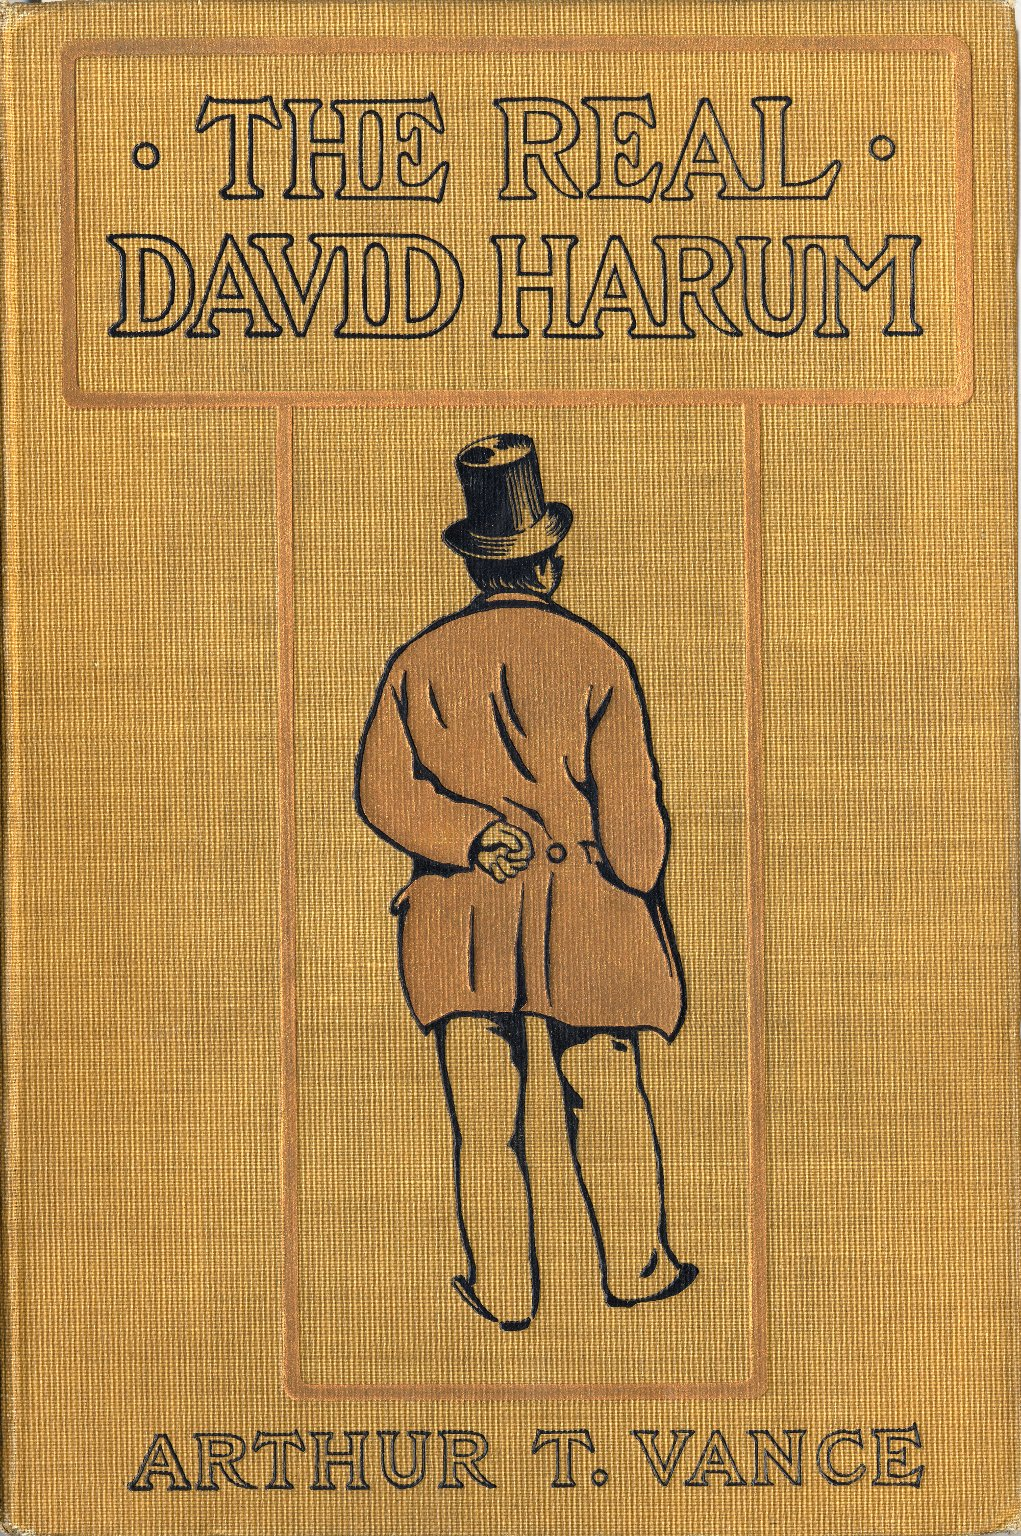 The real David Harum